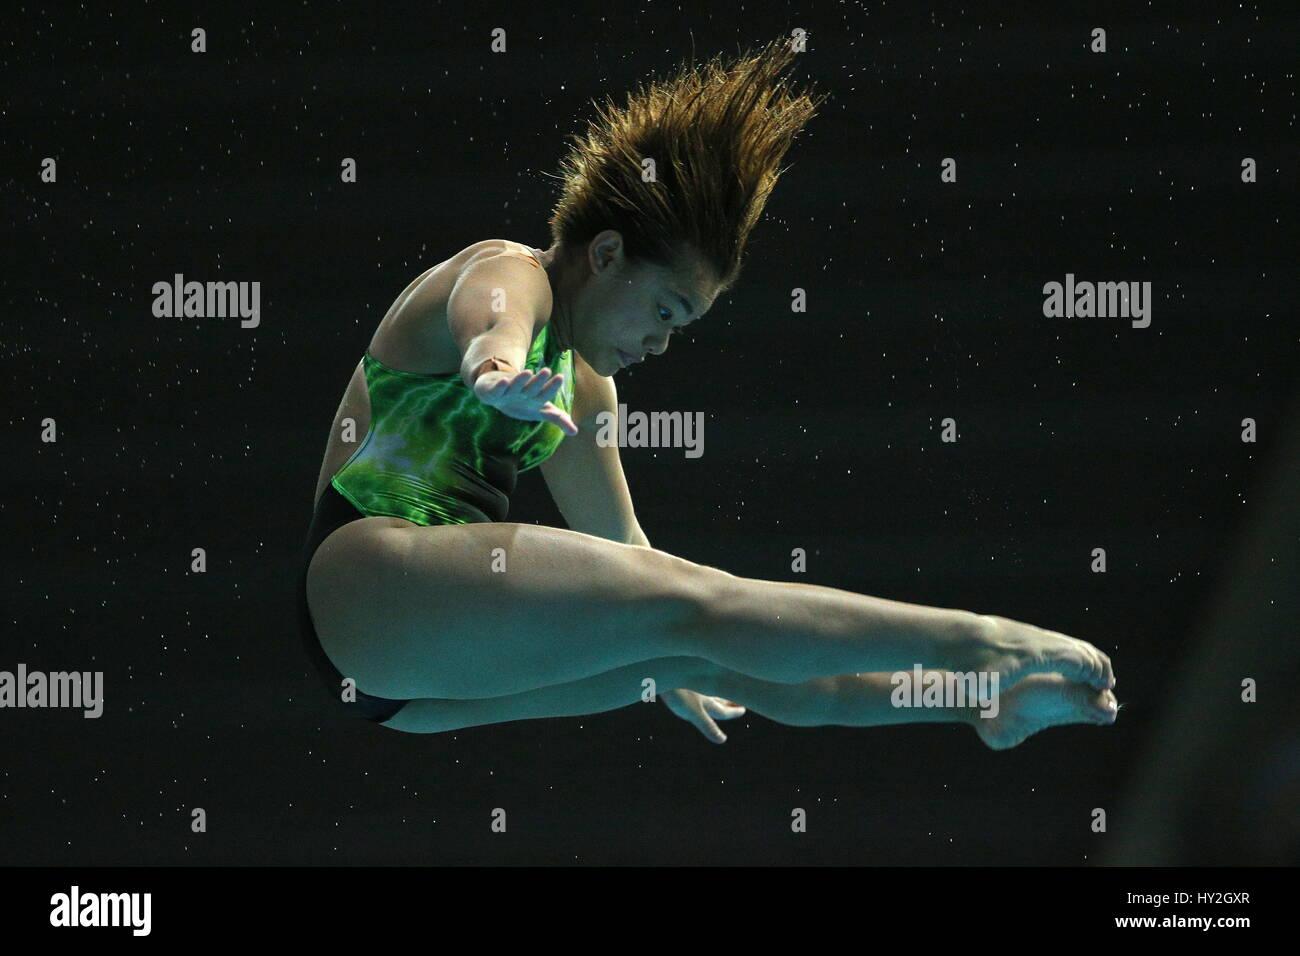 Kazan, Russia. 1st Apr, 2017. Malaysia's Nur Dhabitah Binti Sabri competes in the women's 10m platform final at Stock Photo